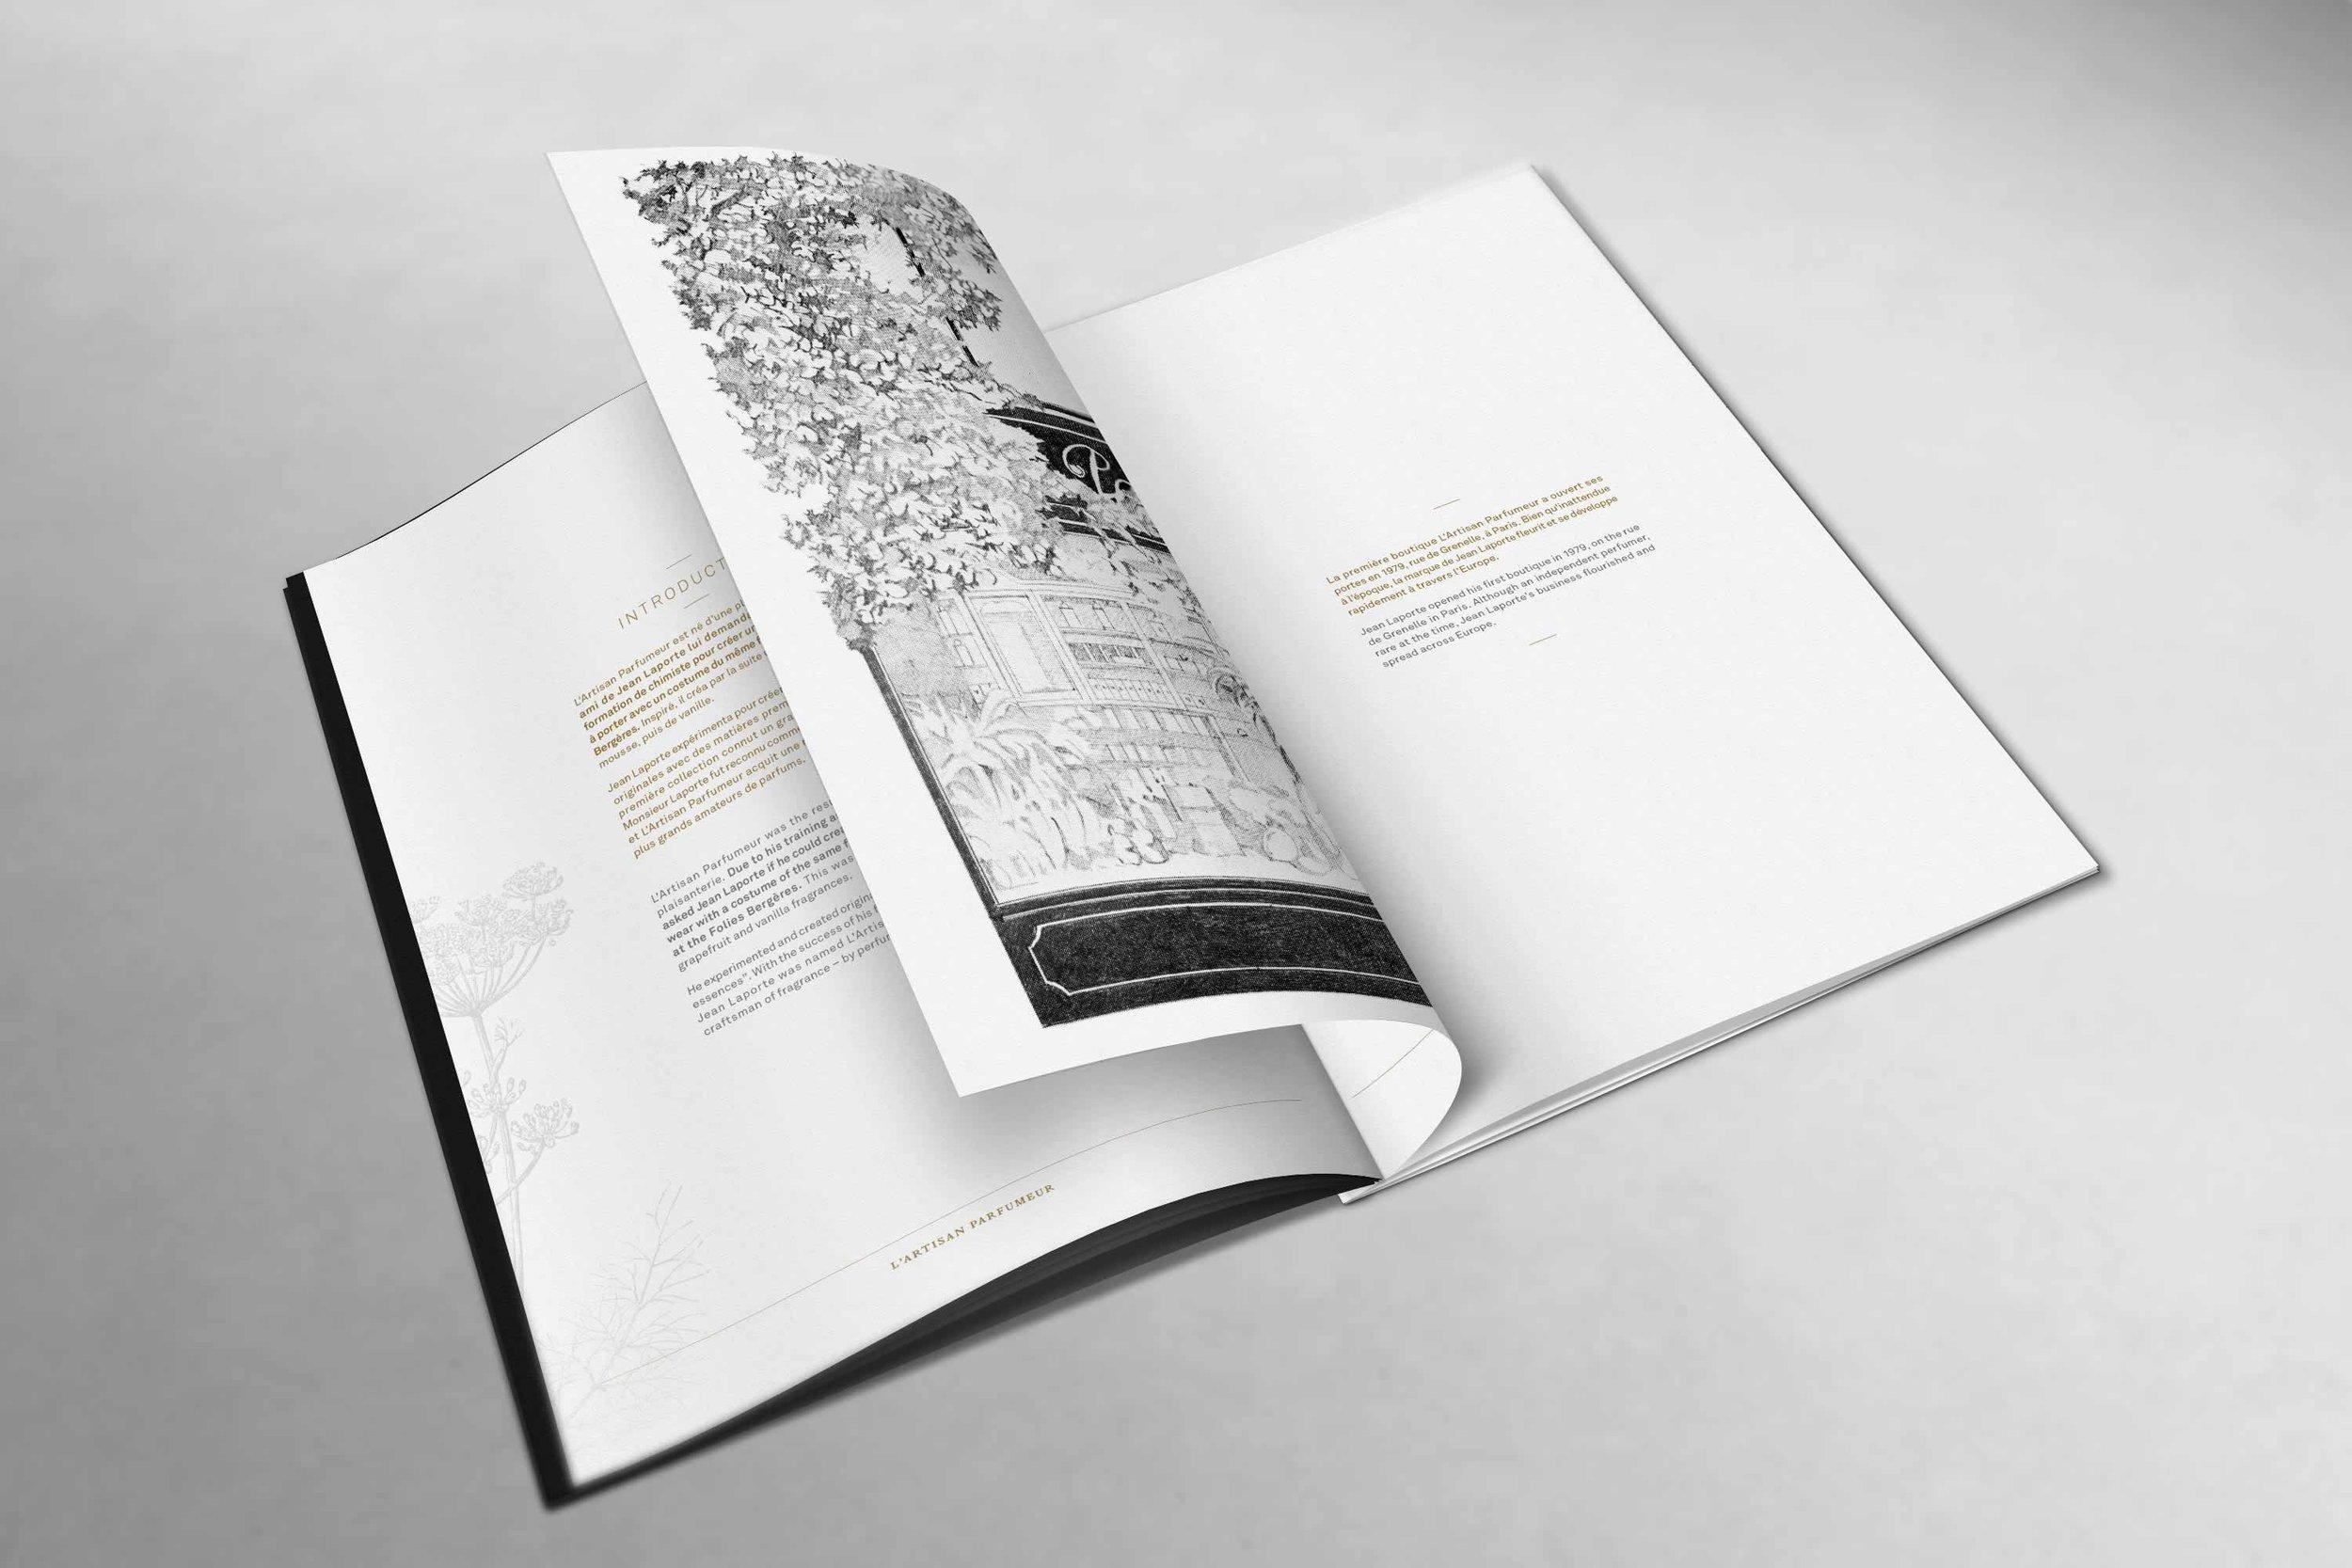 lartisan-parfumeur-visual-identity-design-pressbook-05.jpg